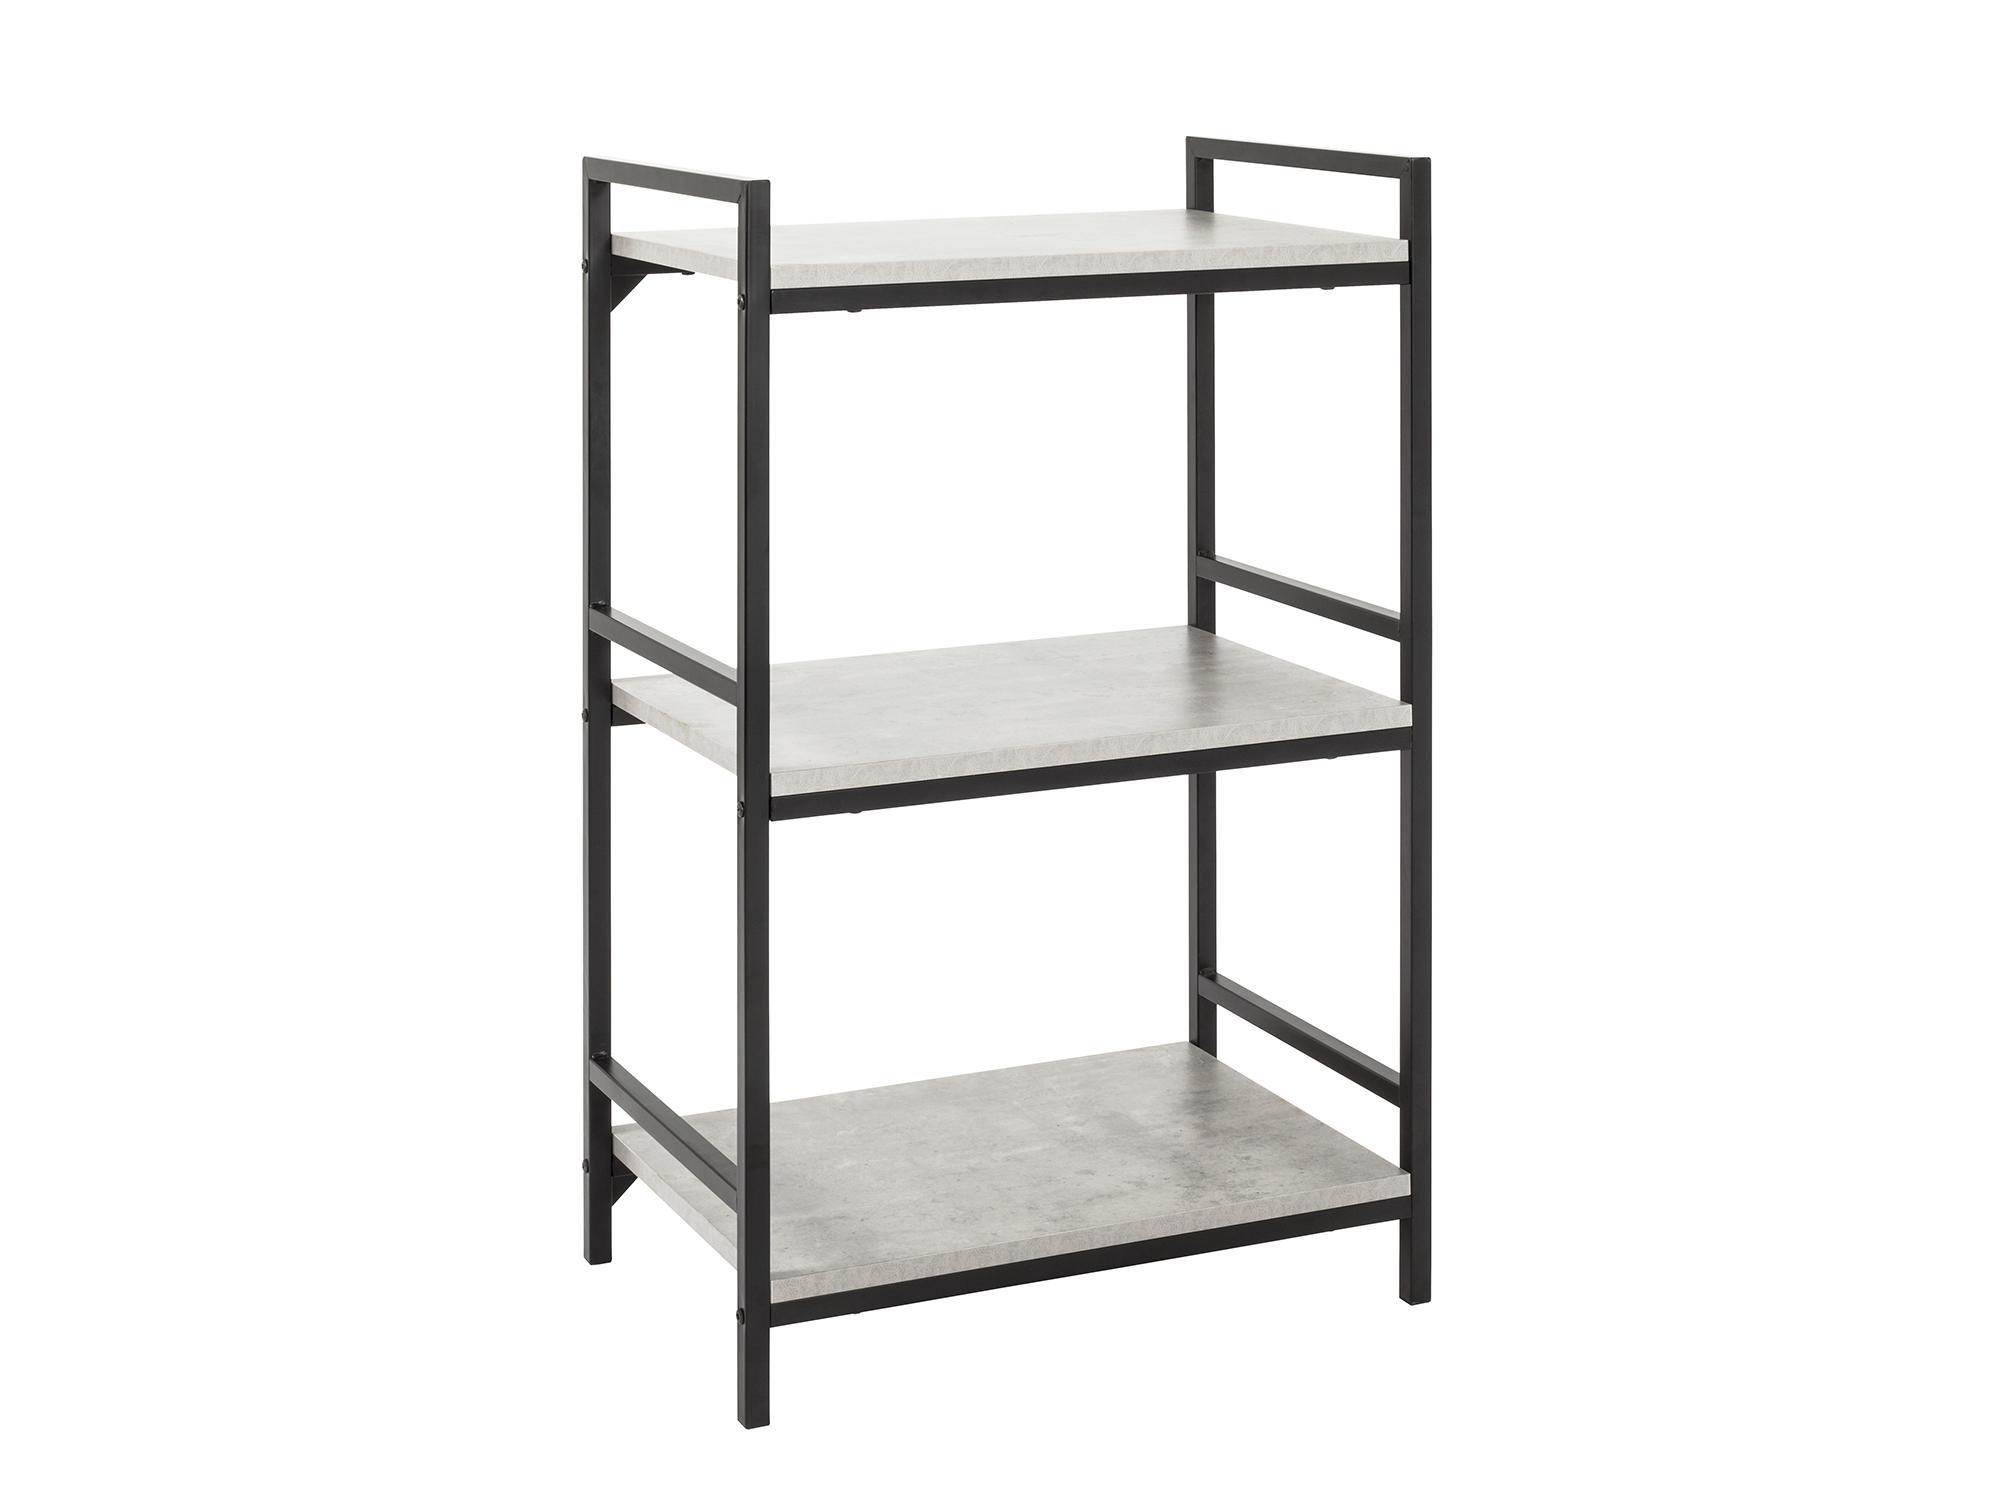 andra regal 3 betonoptik 100 cm. Black Bedroom Furniture Sets. Home Design Ideas